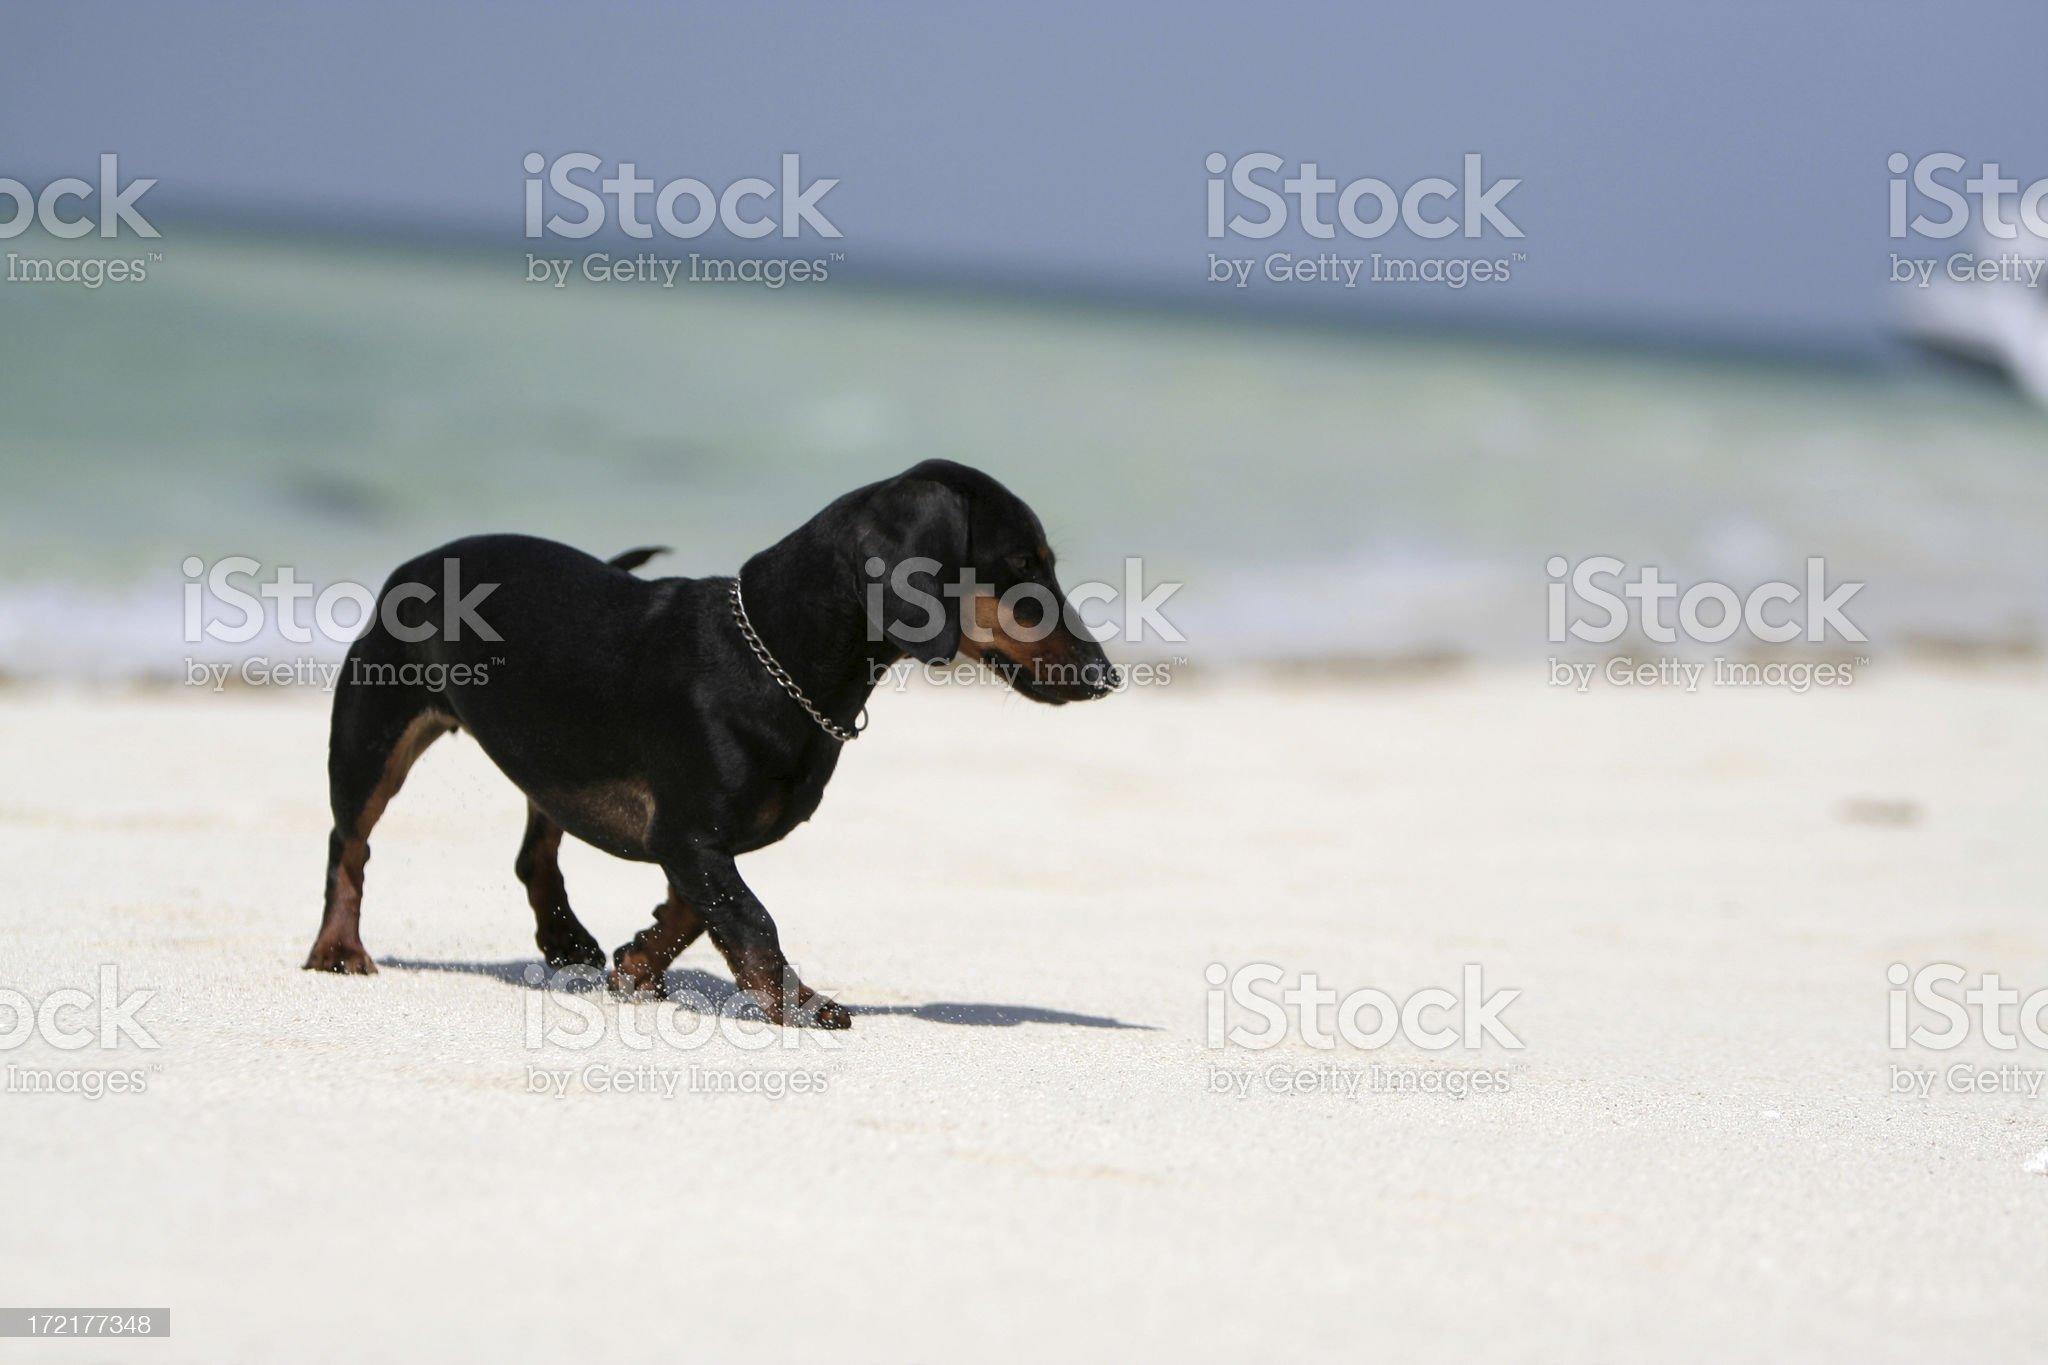 Dachshund on the Beach royalty-free stock photo